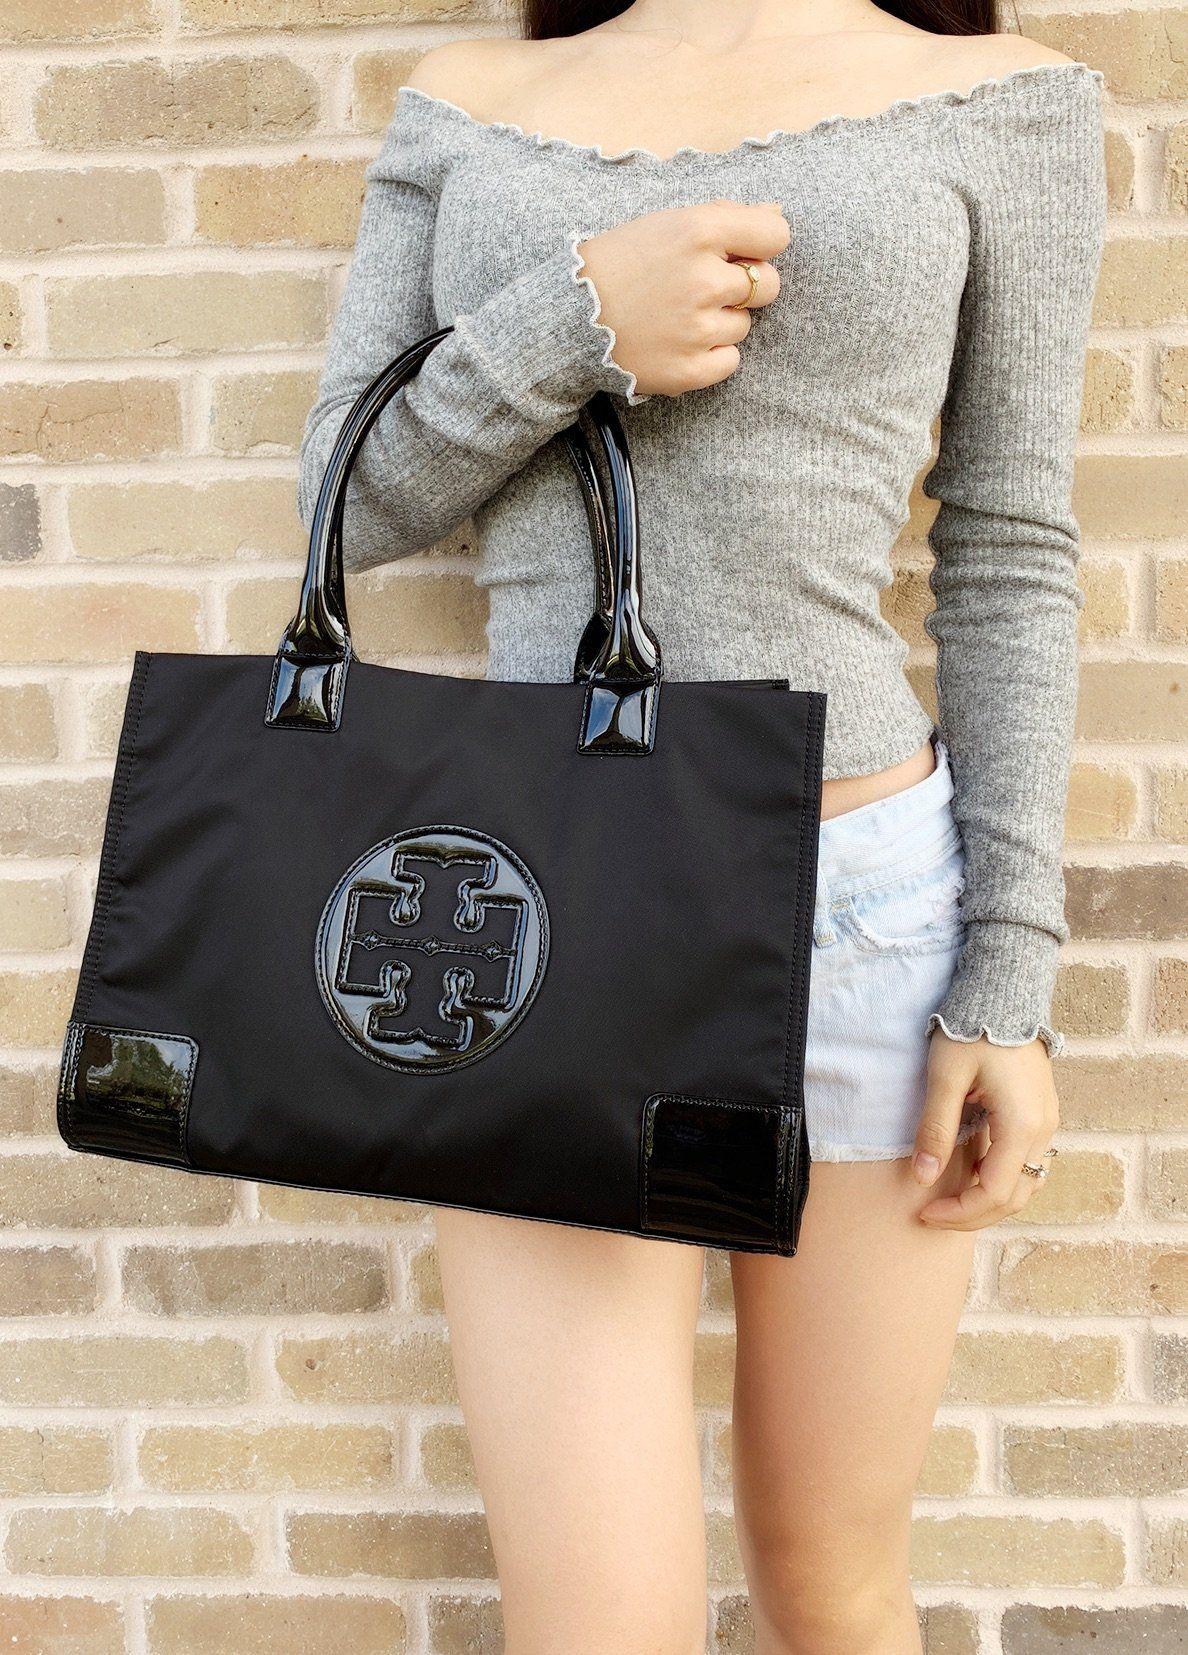 64a8f7fe954b Tory Burch Ella Mini Tote Black Nylon Patent Leather #top #ebaystore  #amazonfashion #posher #topratedseller #mercariapp #amazon #Handbags # GabysBags # ...